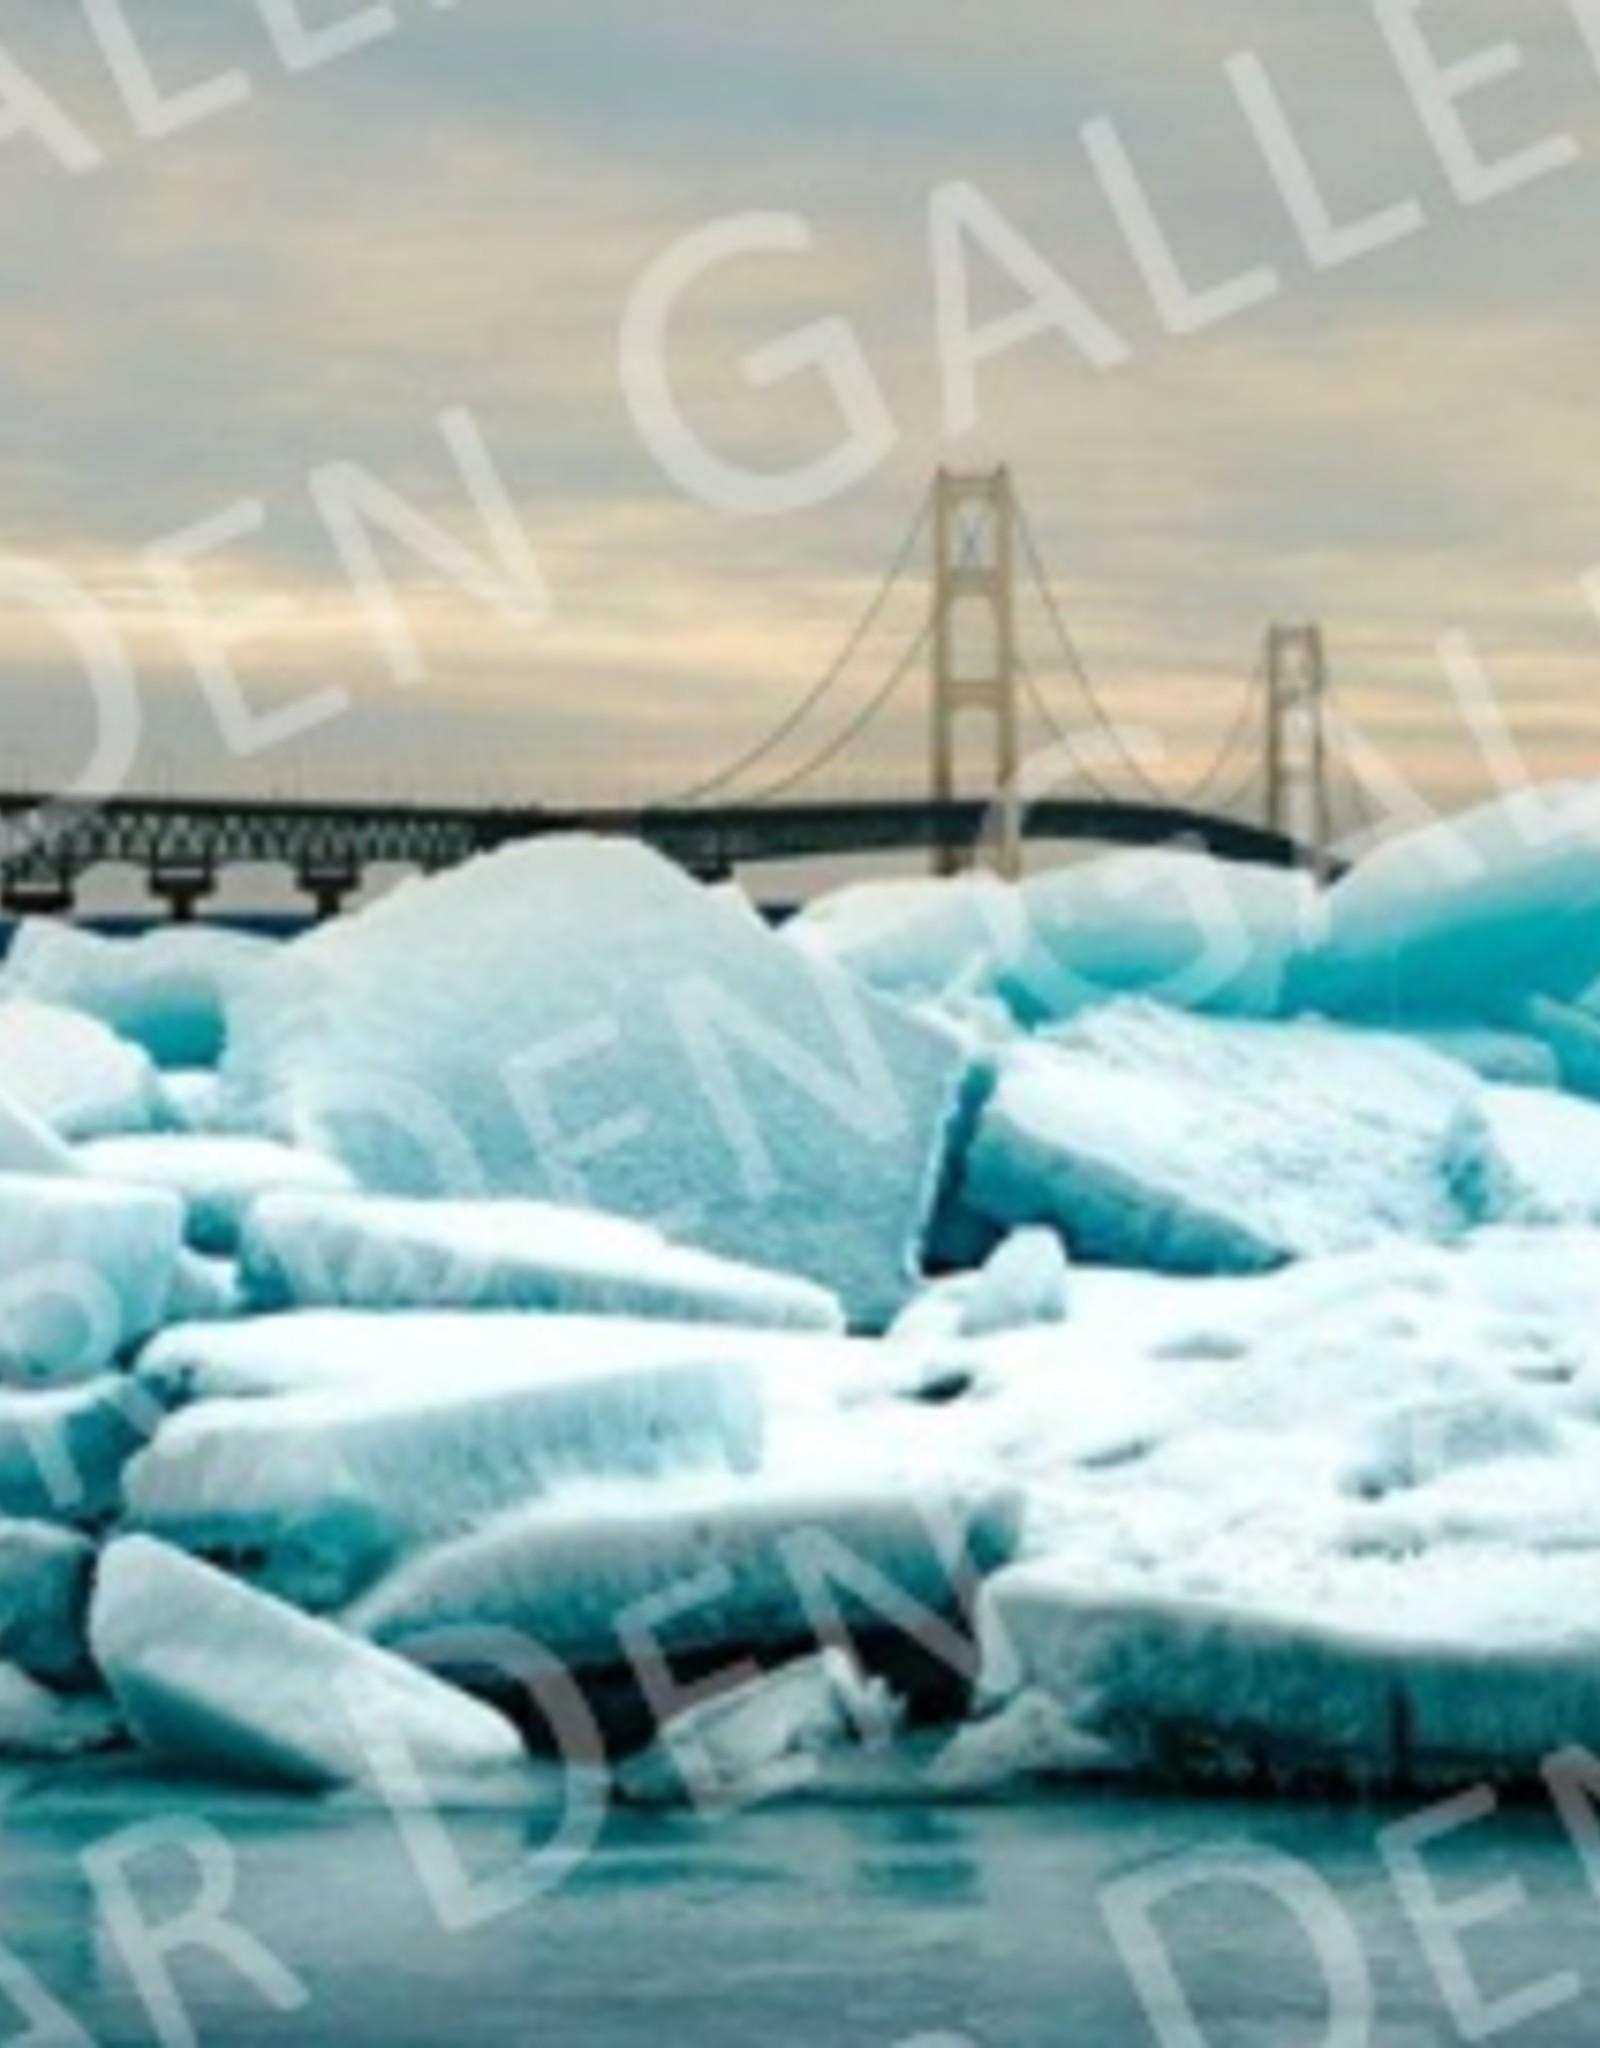 "Nick Irwin Images Mackinac Bridge Blue Ice - 5"" x 7"" Matted Print"